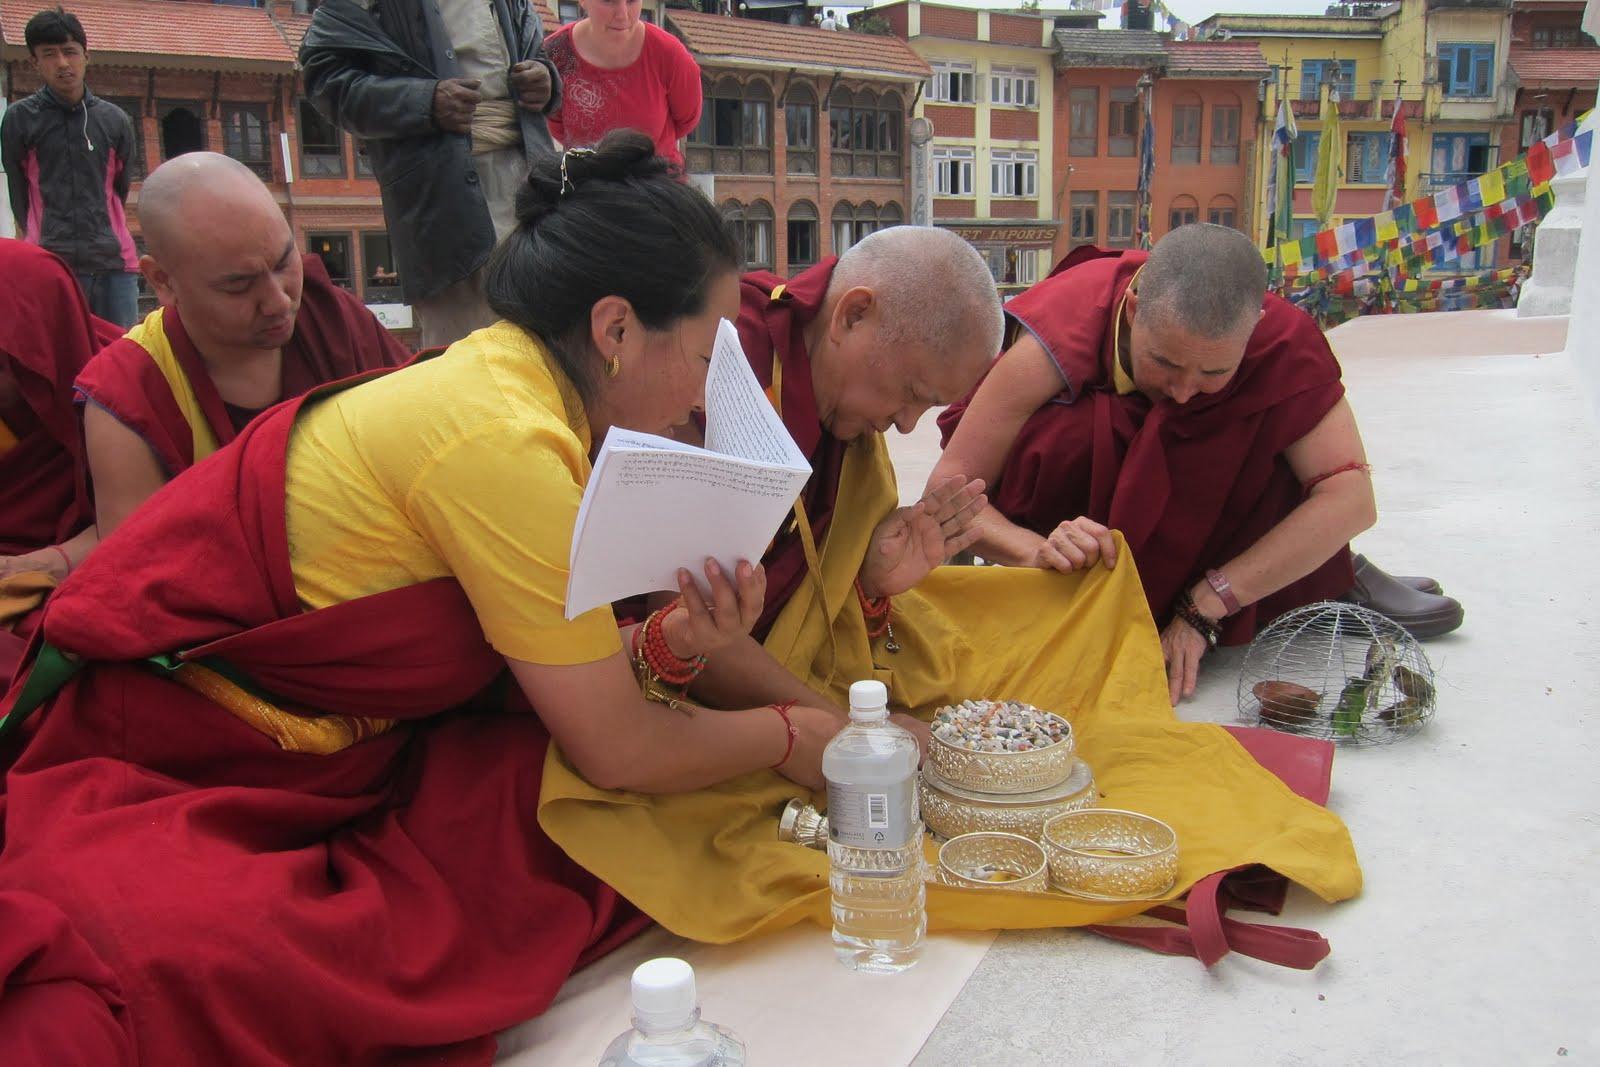 Rinpoche and Khadro-la offering mandala at Bouddha Stupa. With Ani. Jan. Photo by Ven.Sarah Thresher. April 18, 2013